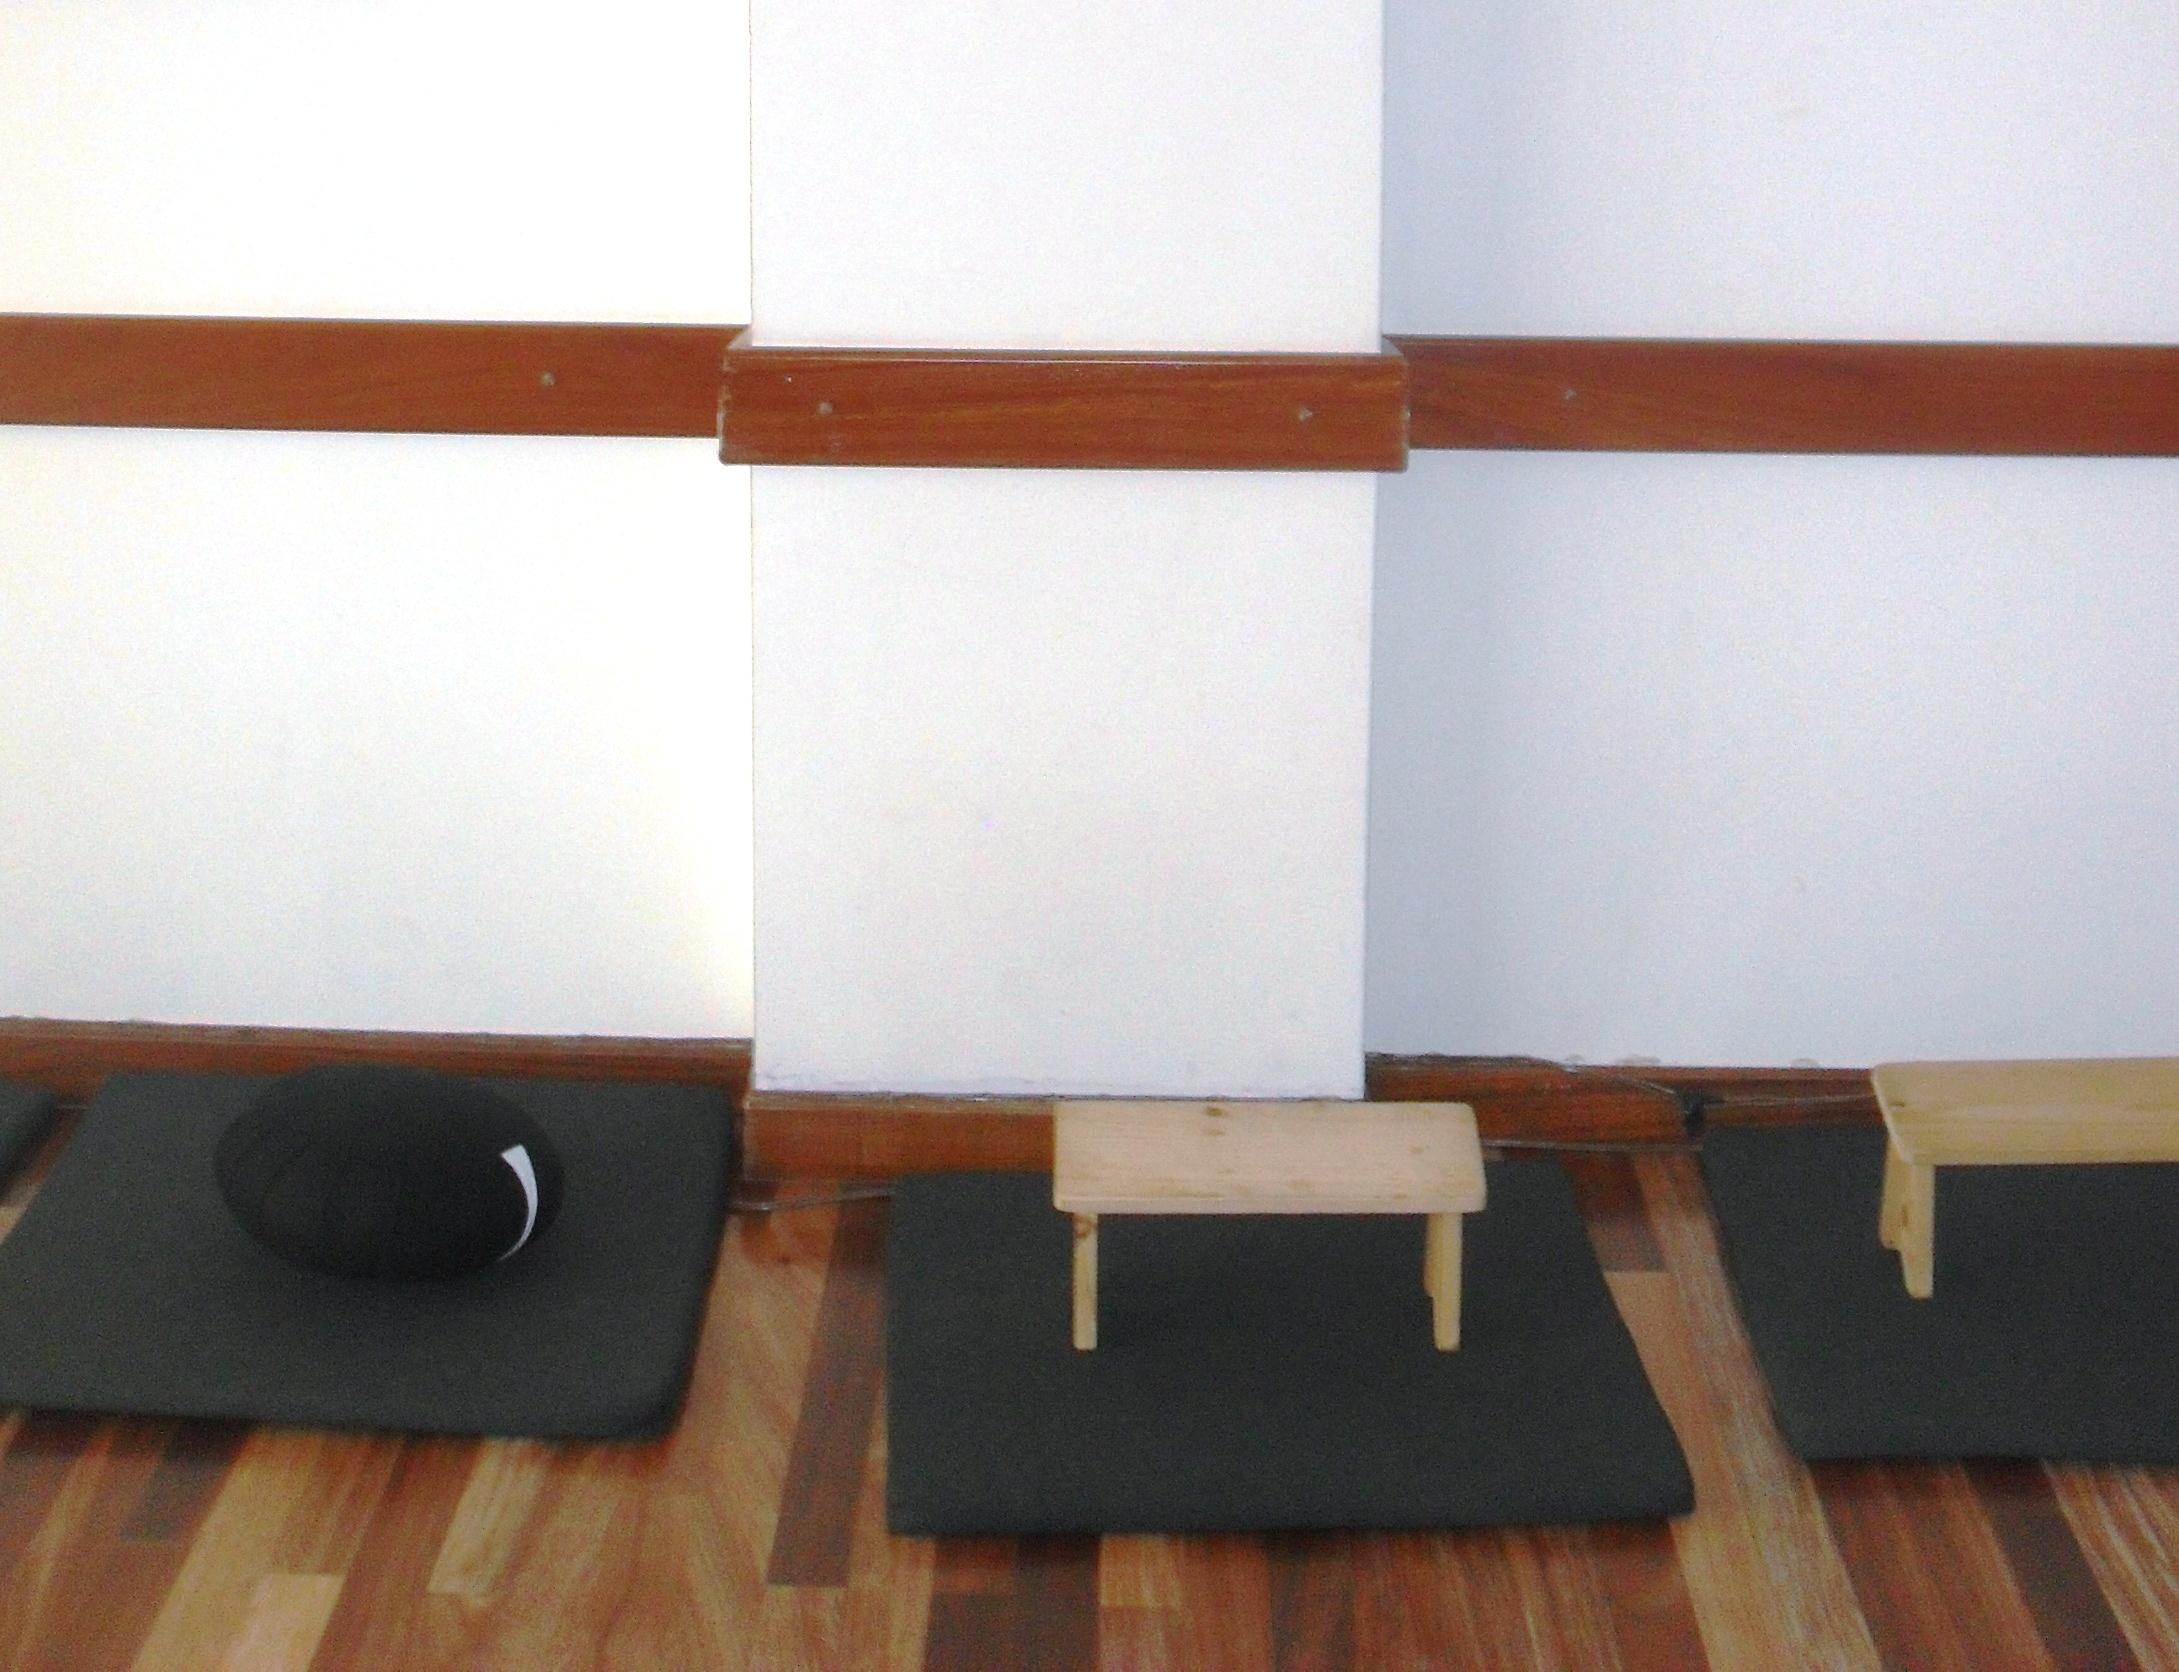 Sesión de Meditación.2 - copia.JPG